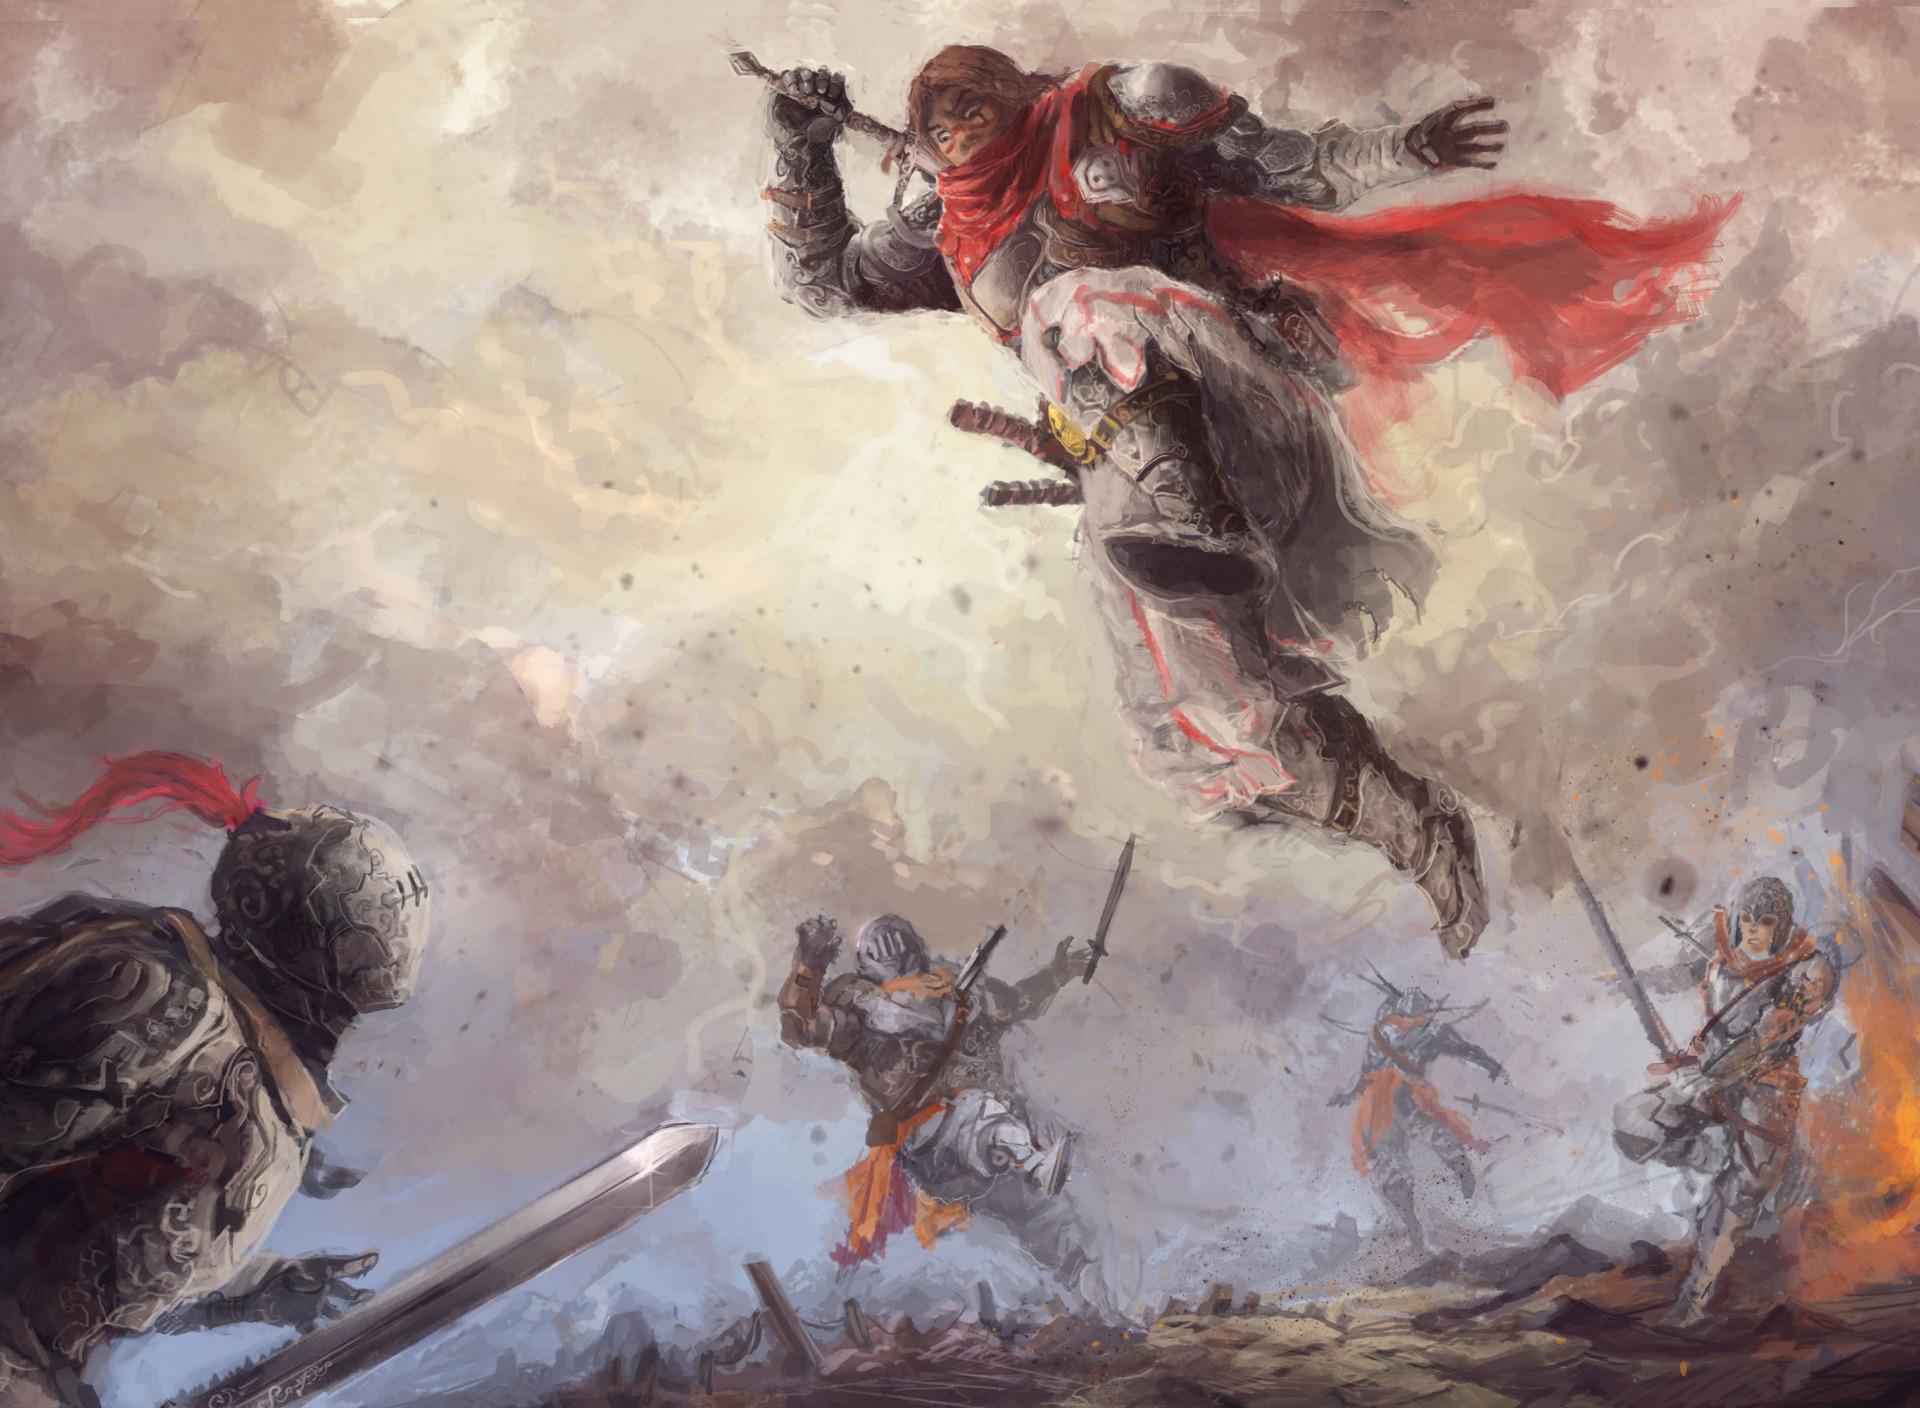 картинки с павшими воинами